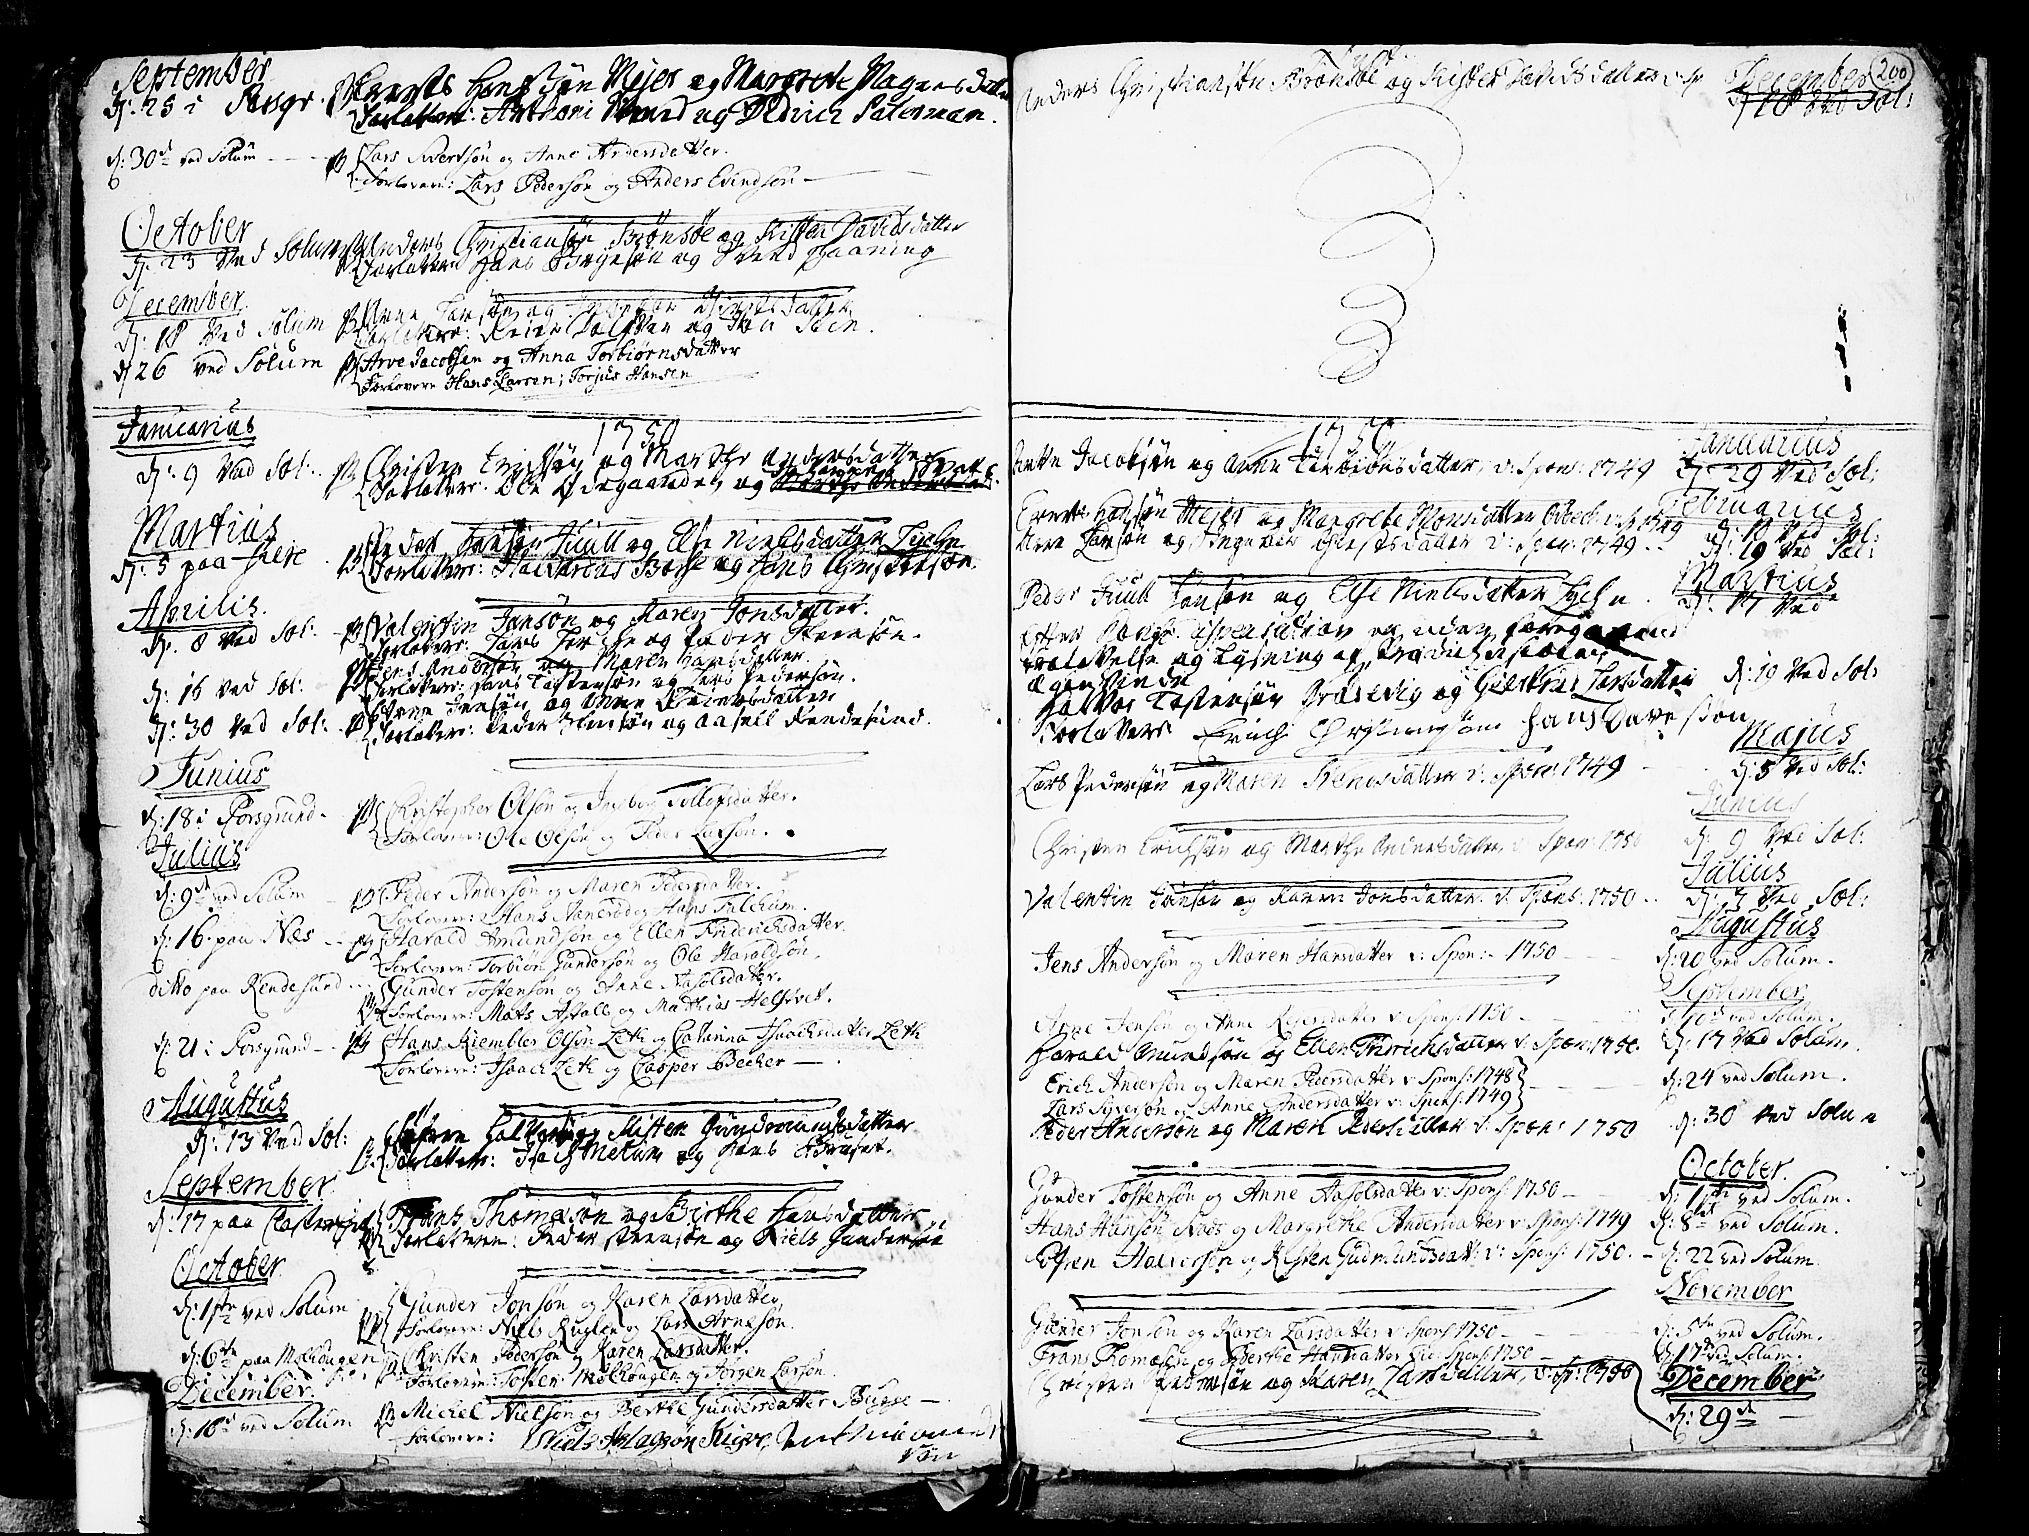 SAKO, Solum kirkebøker, F/Fa/L0002: Ministerialbok nr. I 2, 1713-1761, s. 200